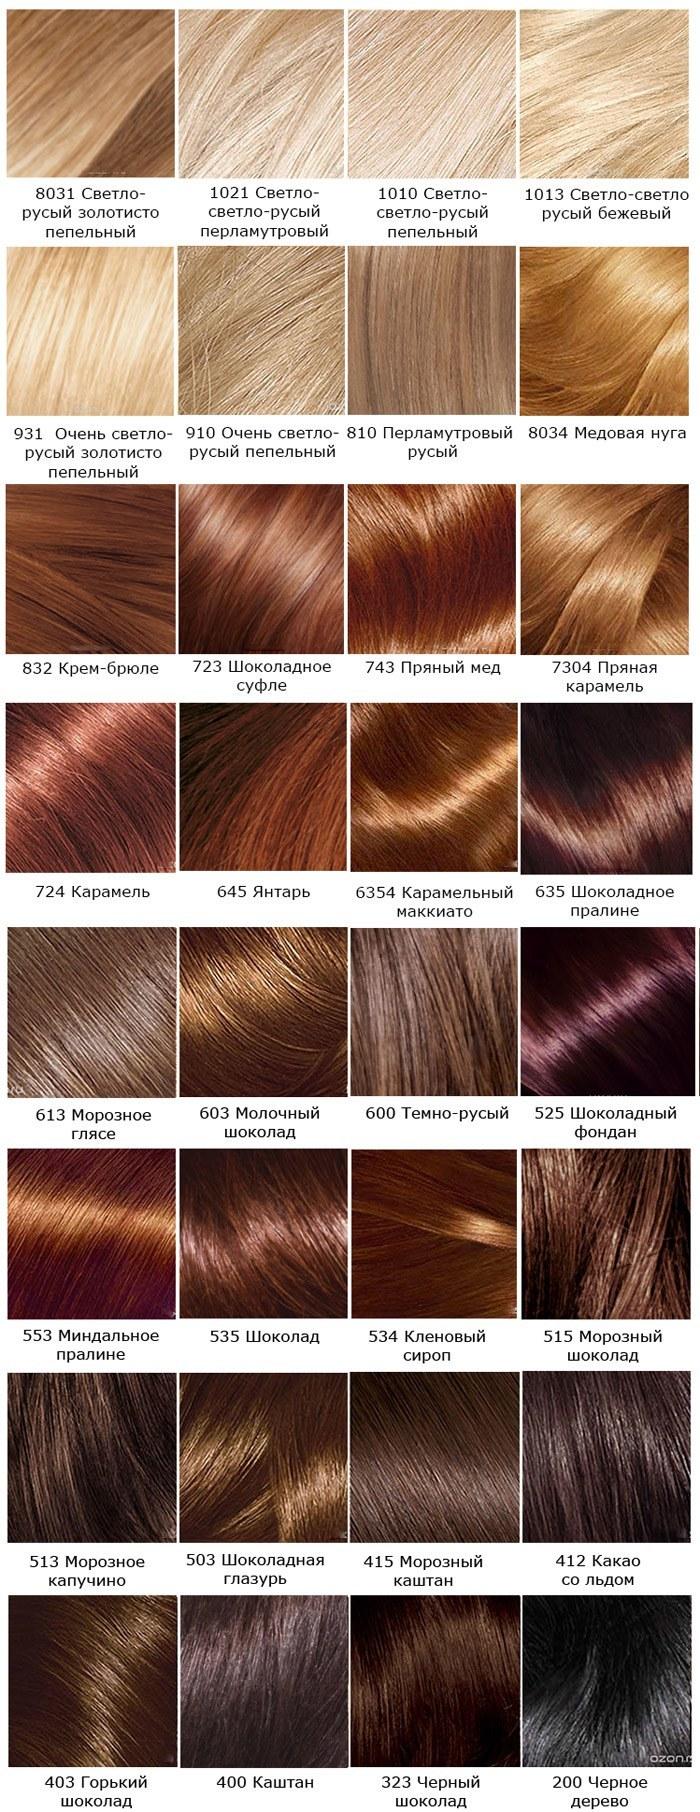 Оттенки цветов и их названия фото волос